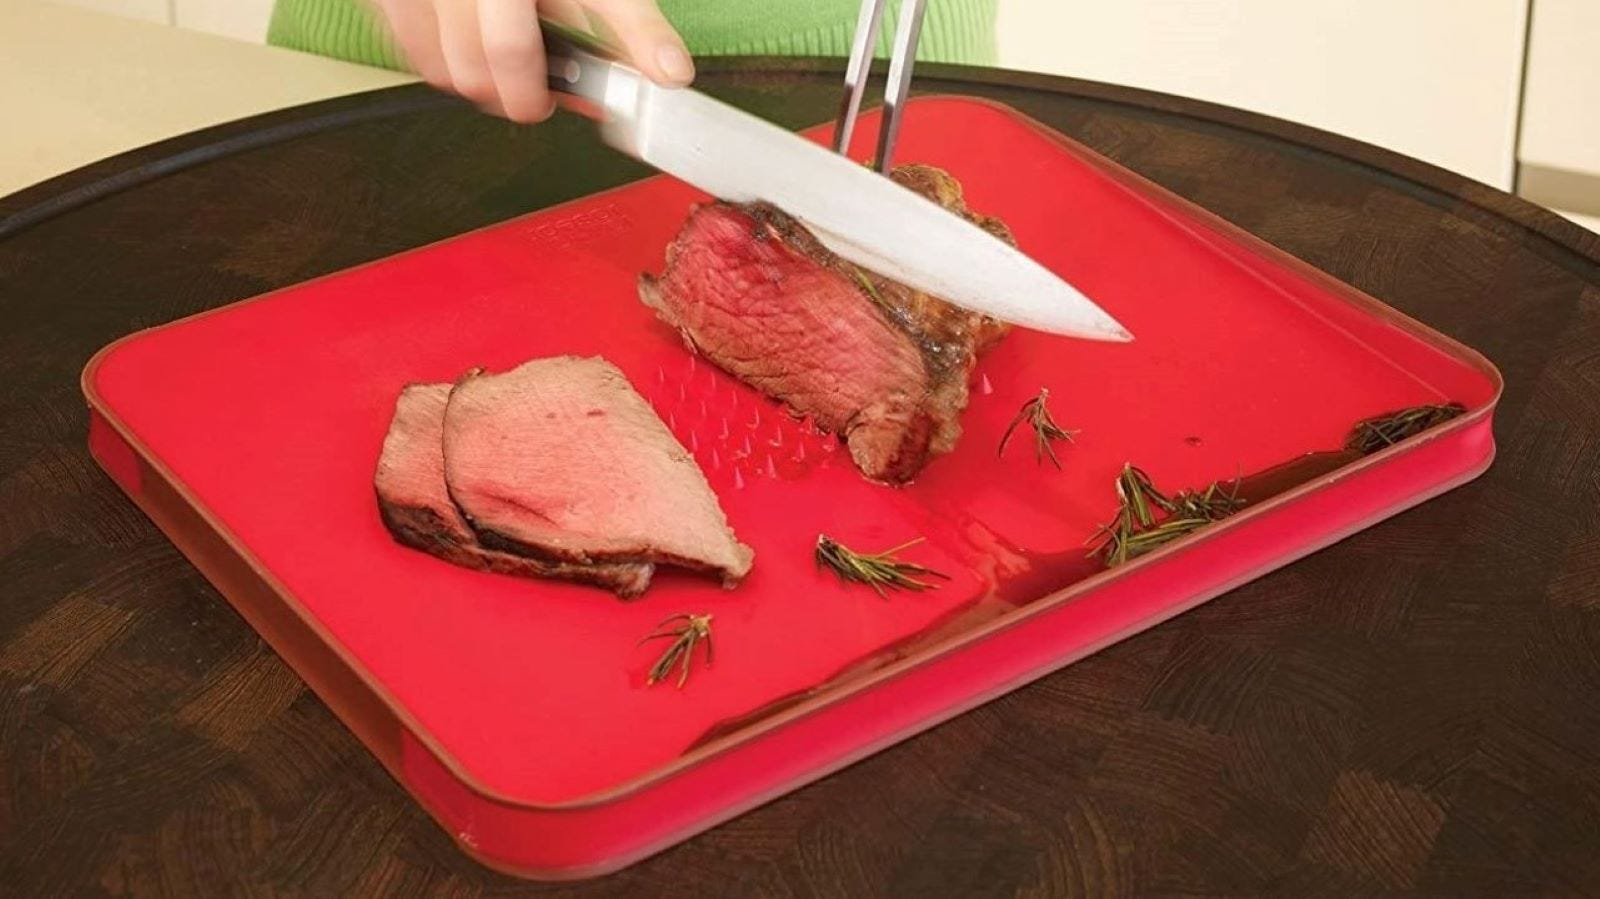 Someone slicing roast beef on the Joseph Joseph Meat Cutting Board.